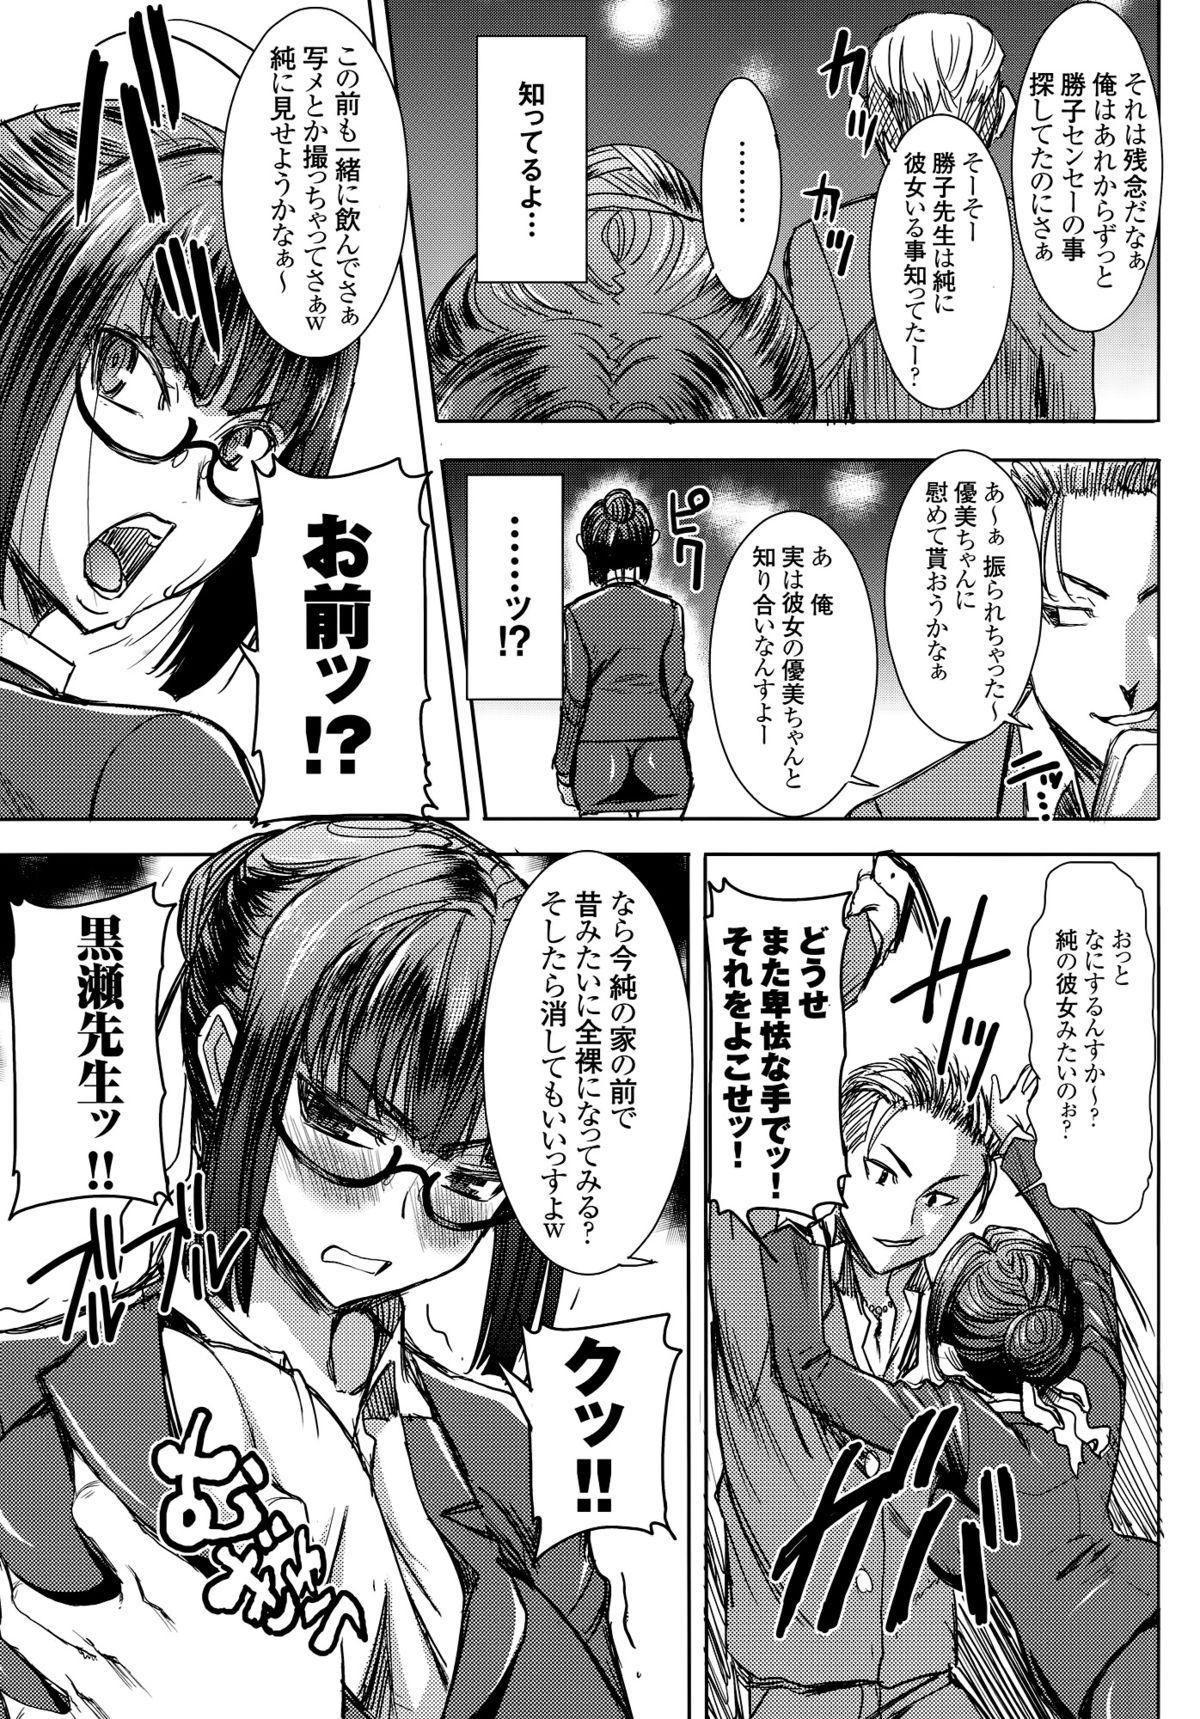 Unsweet Kurose Katsuko Plus Kakugo... 3